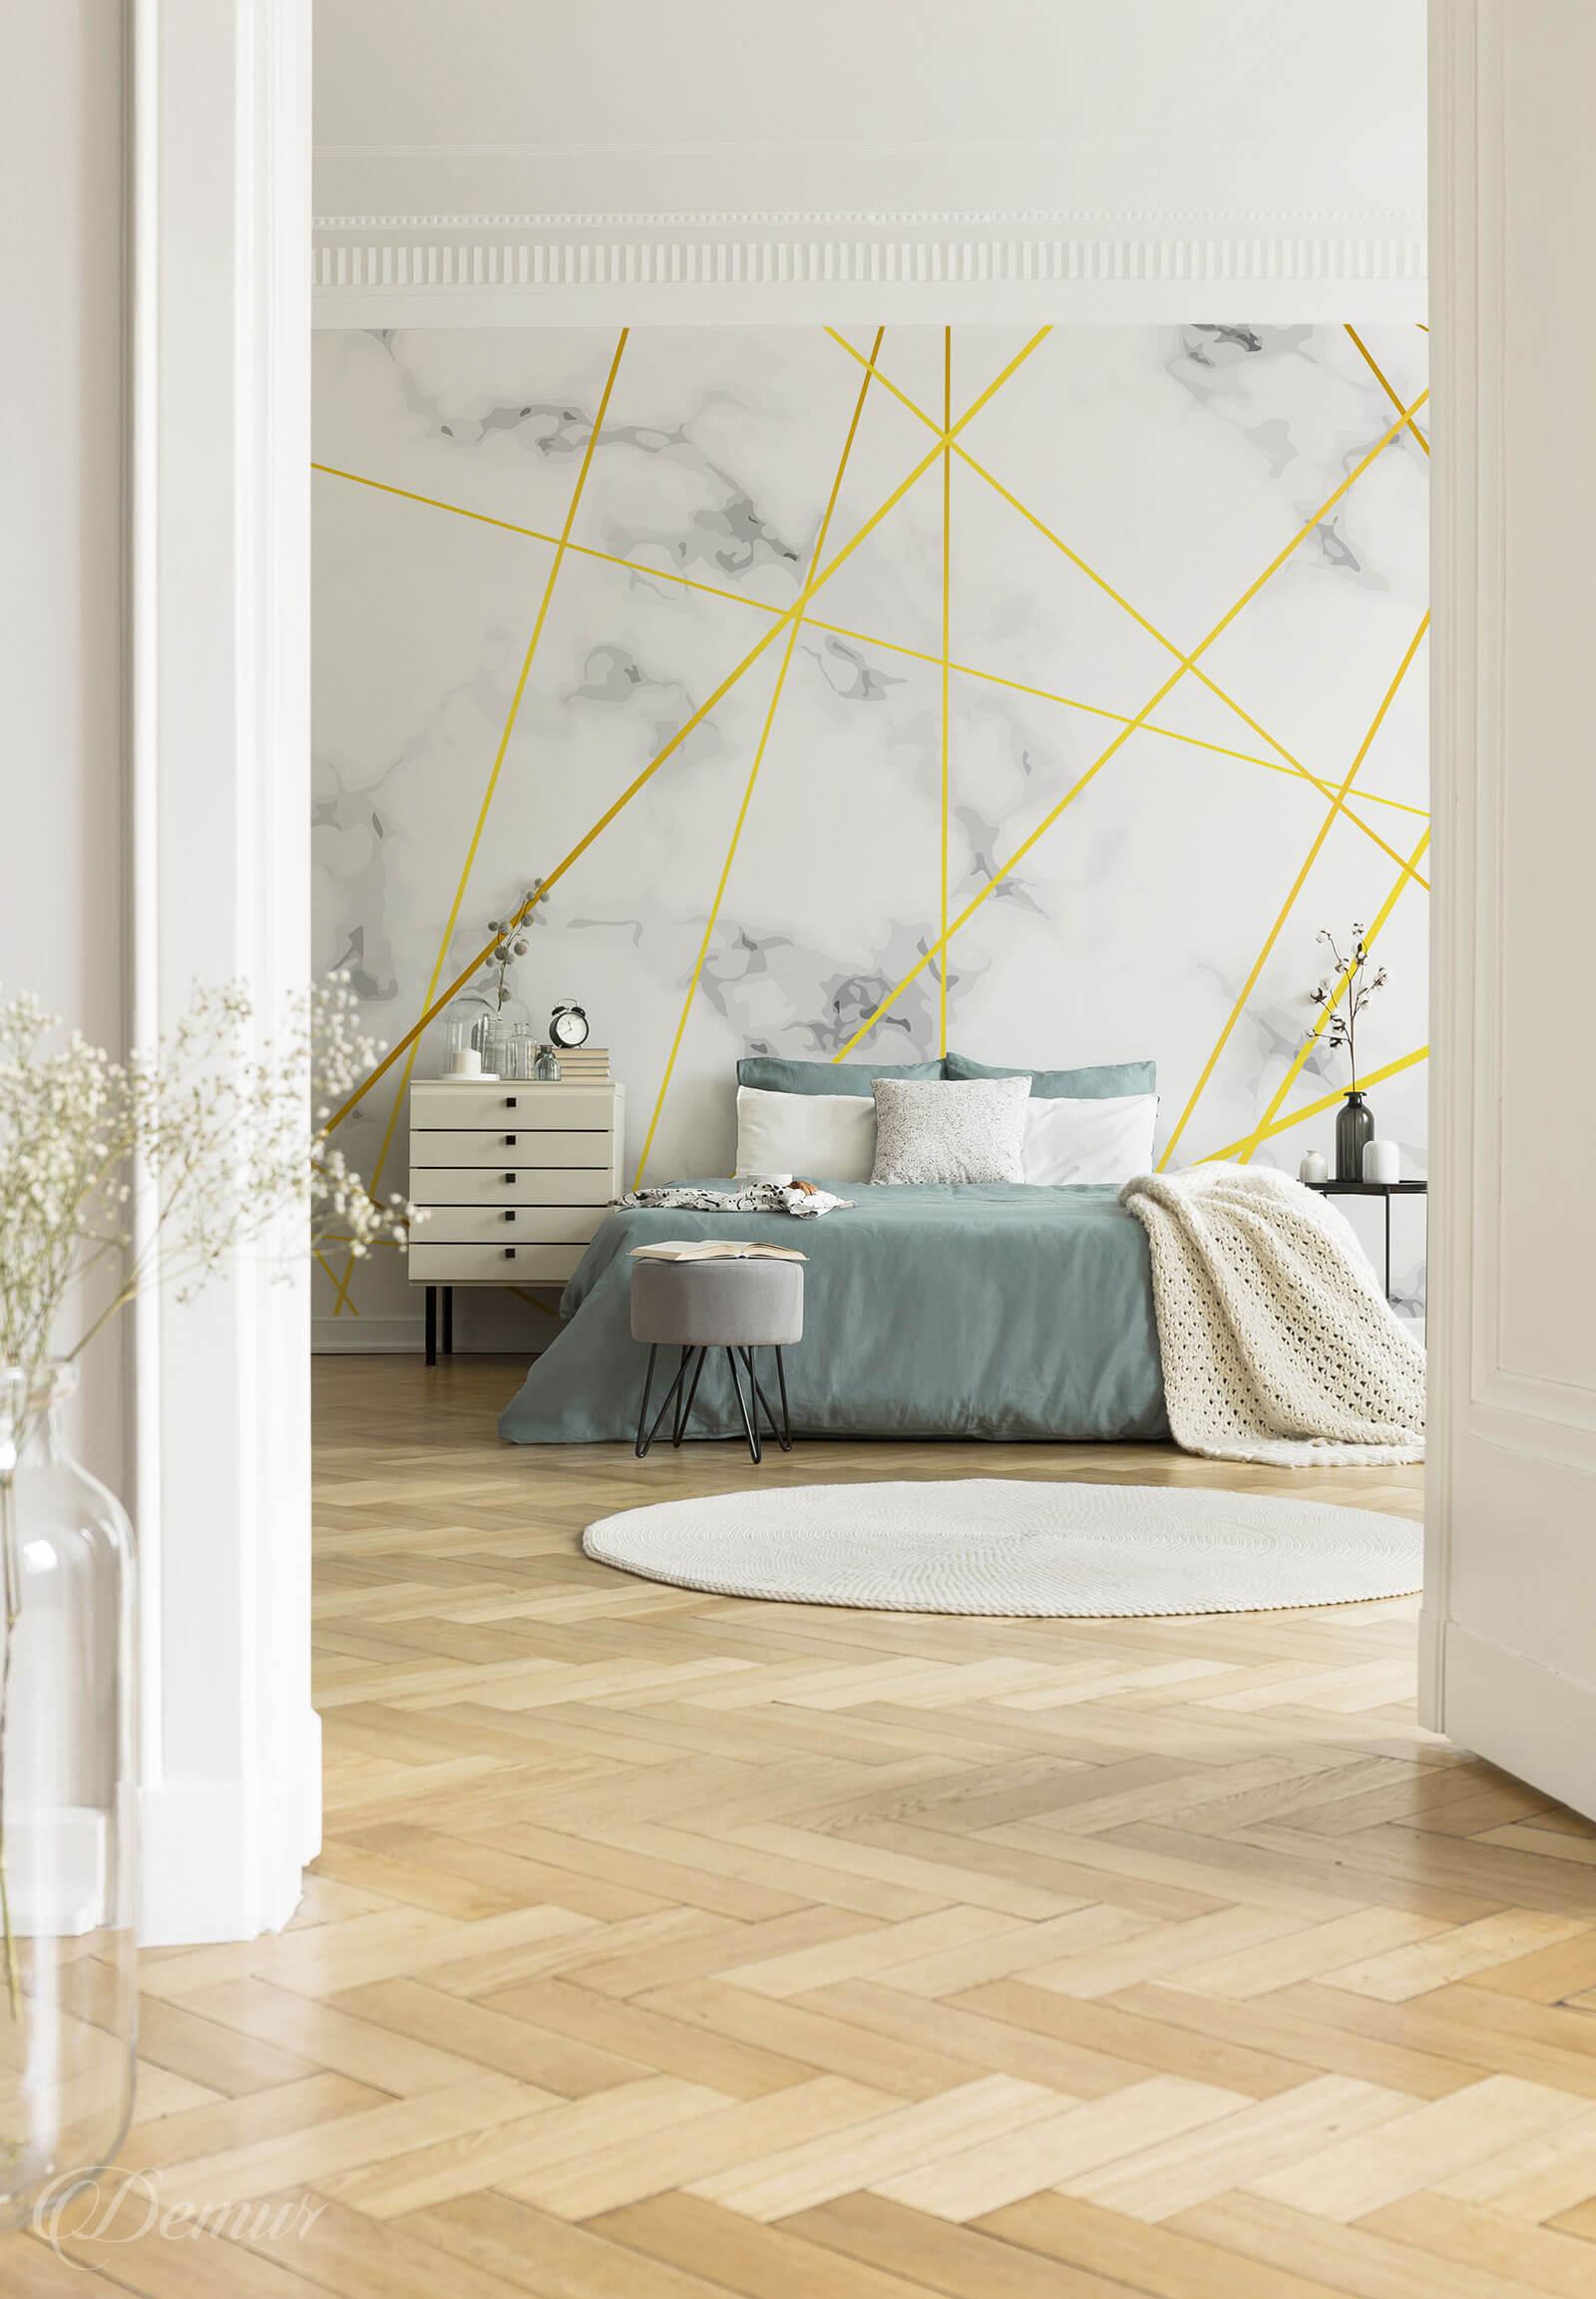 Fototapeta marmurowa geometria - Fototapeta w sypialni - Demur